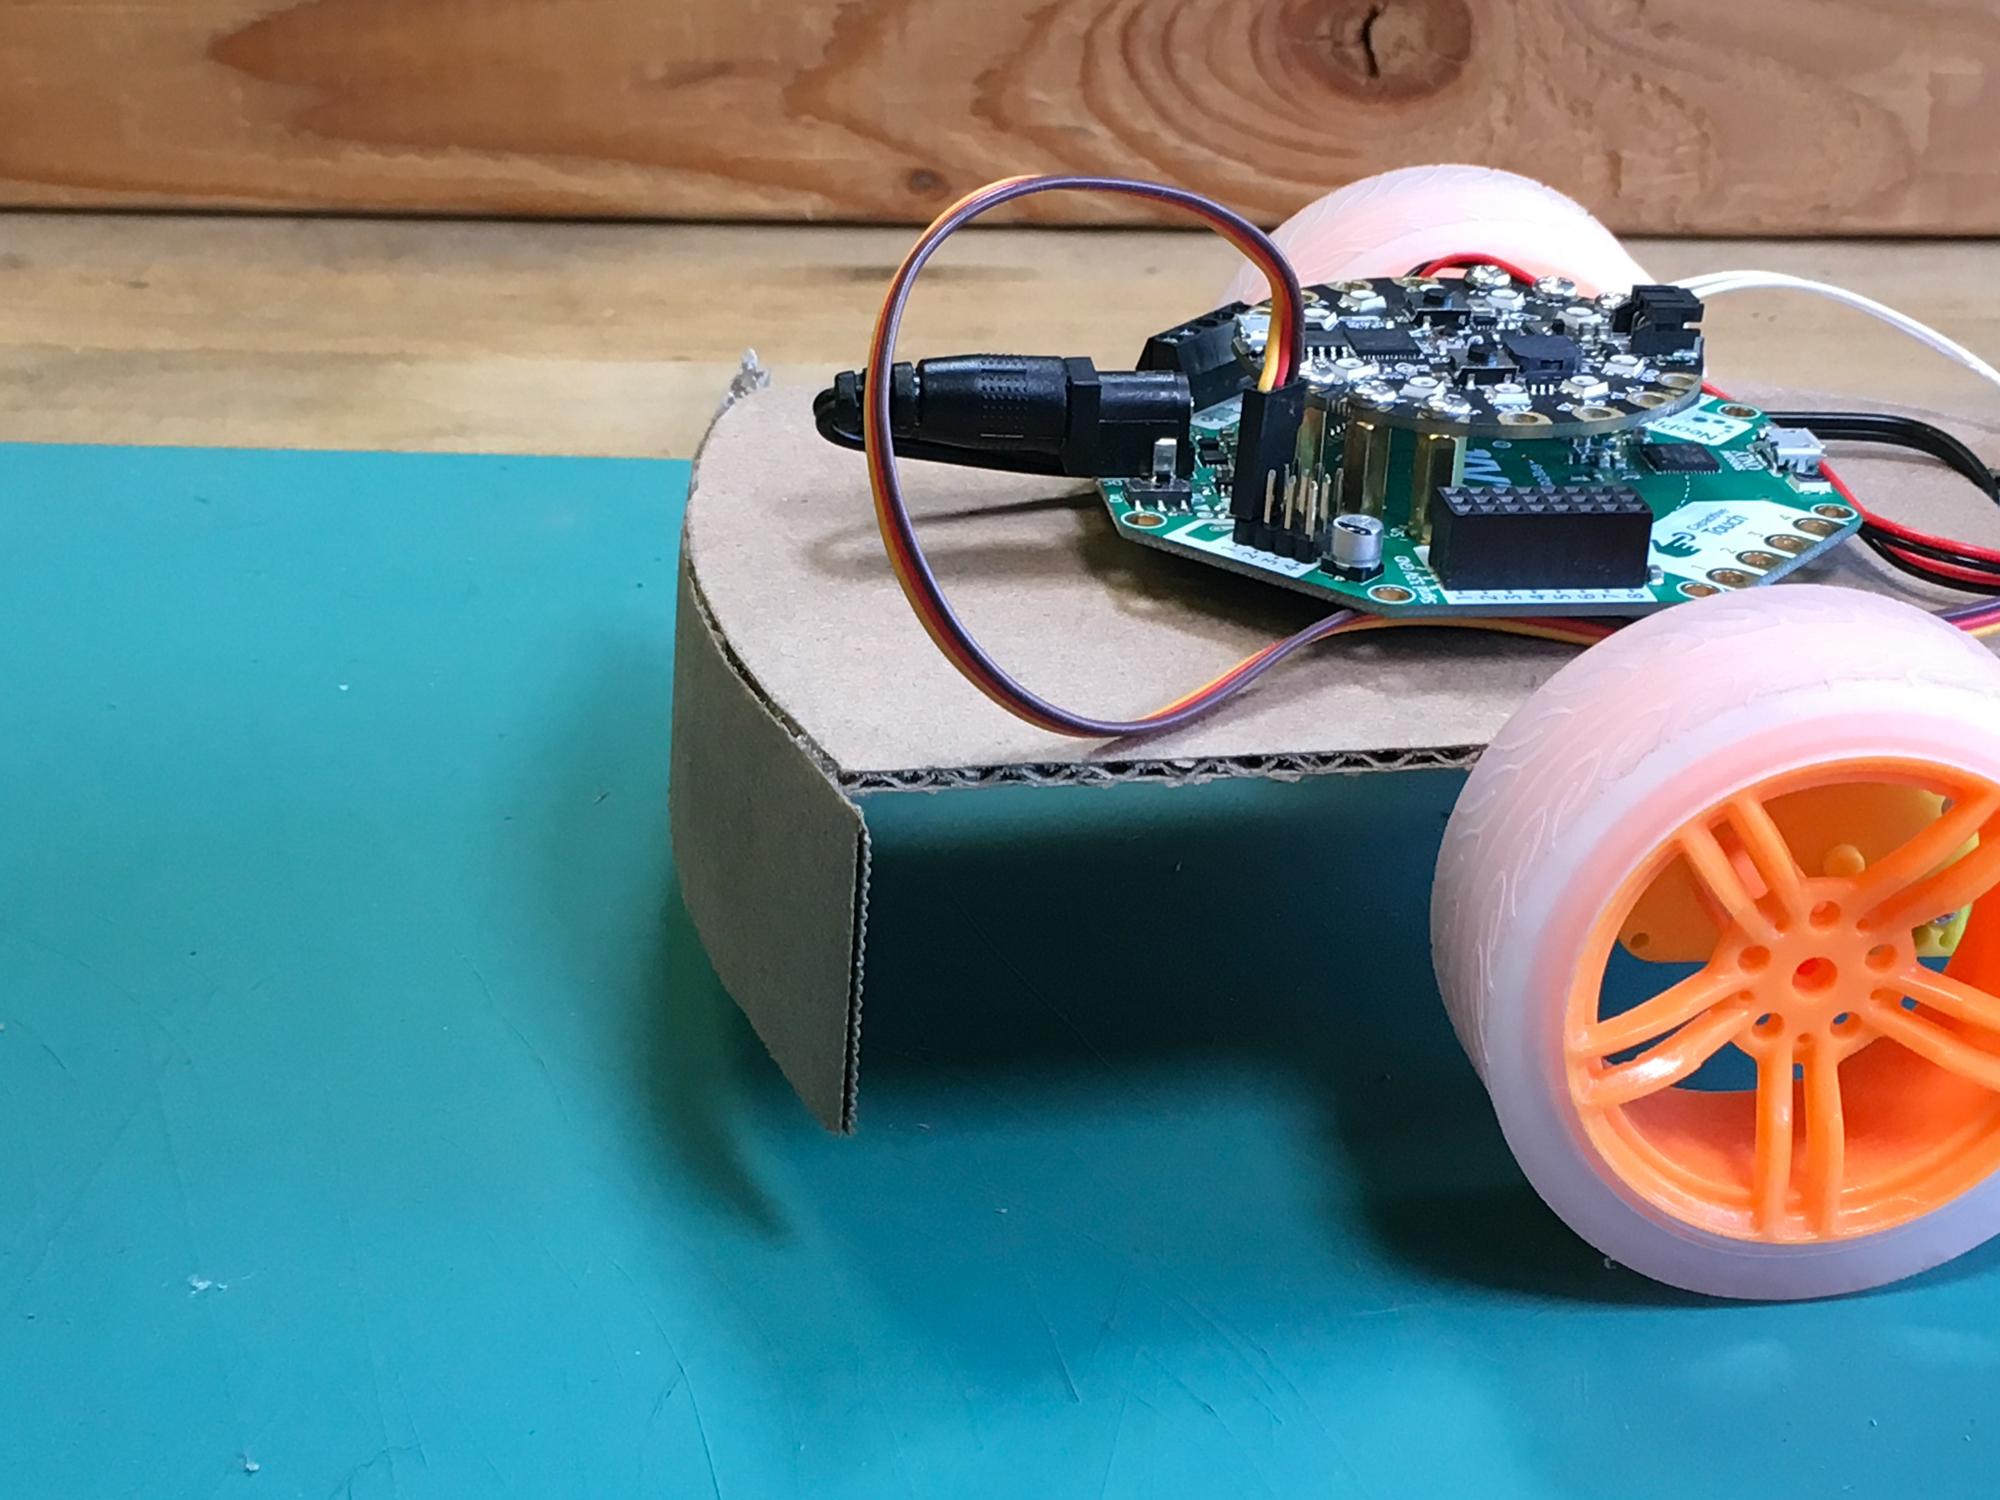 robotics___cnc_bumperBot_IMG_3536_2k.jpg